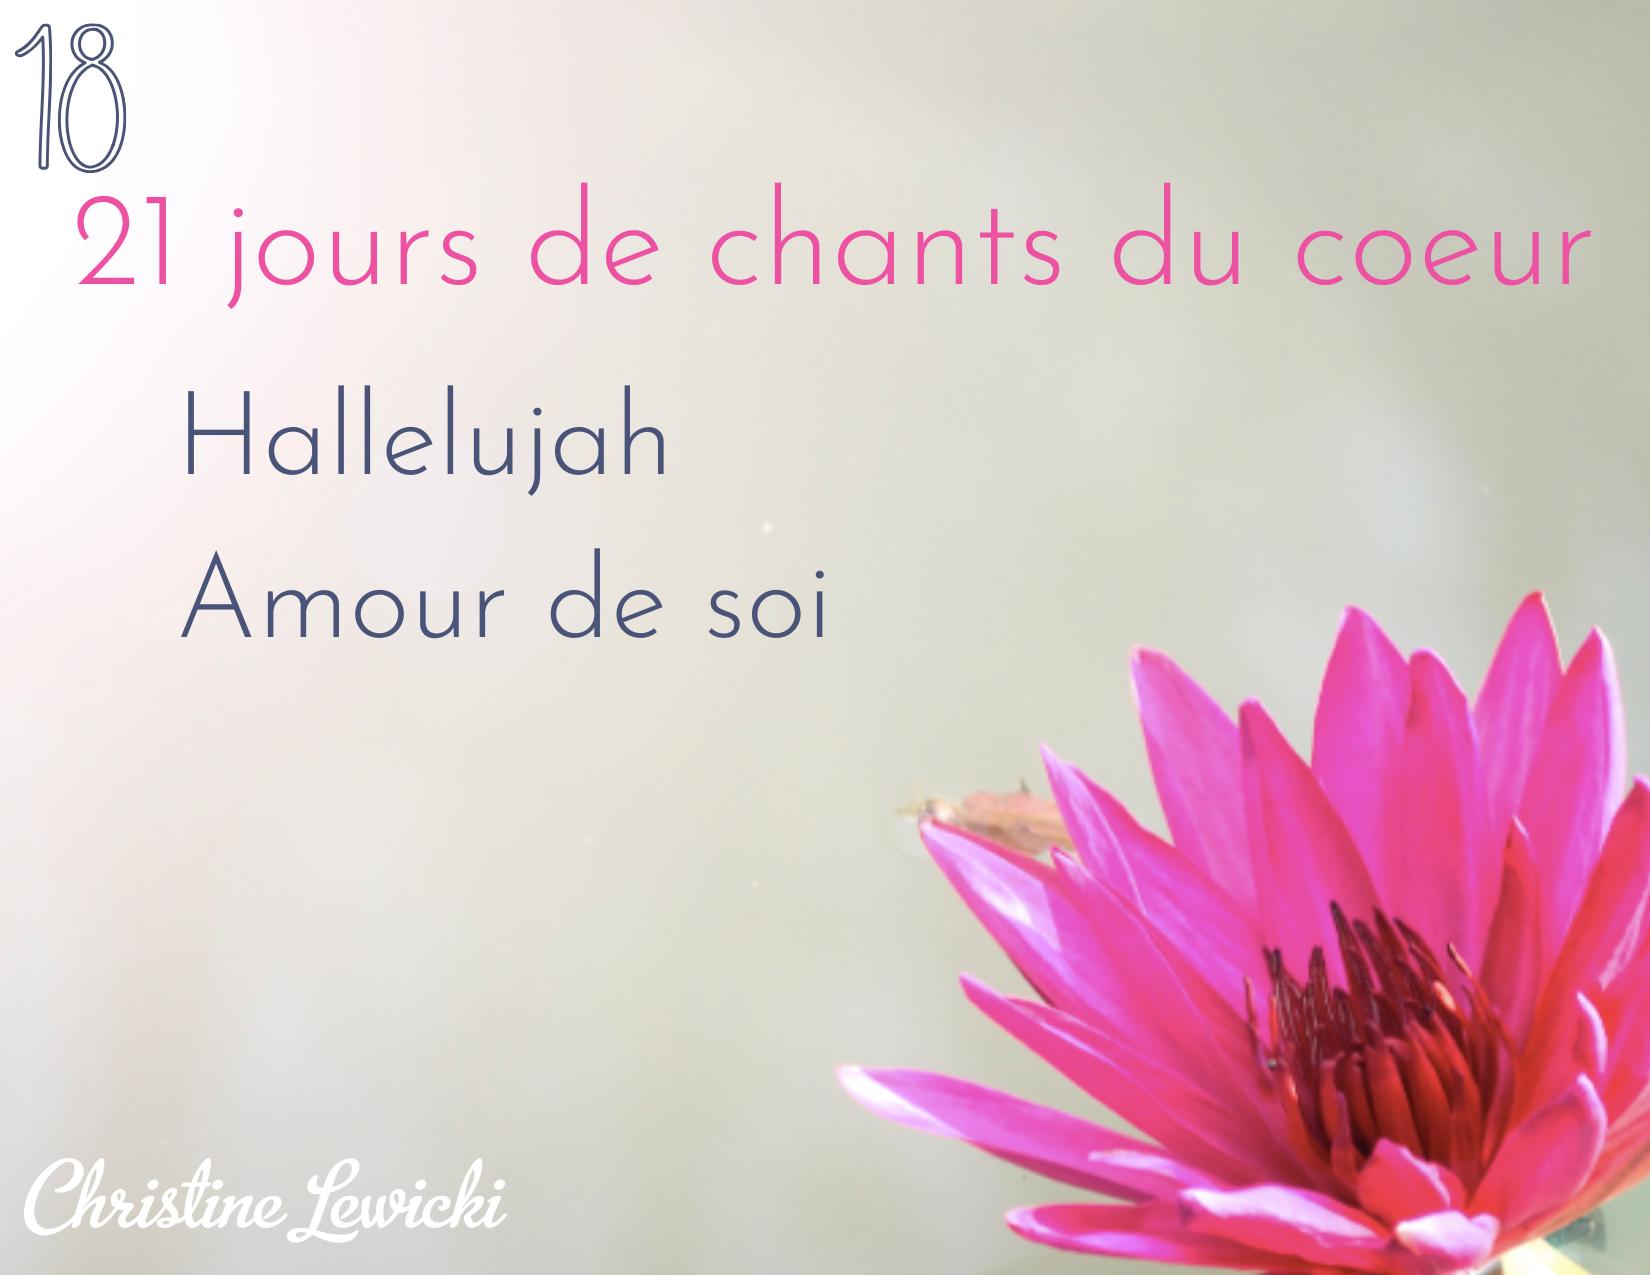 Hallelujah - Amour de soi